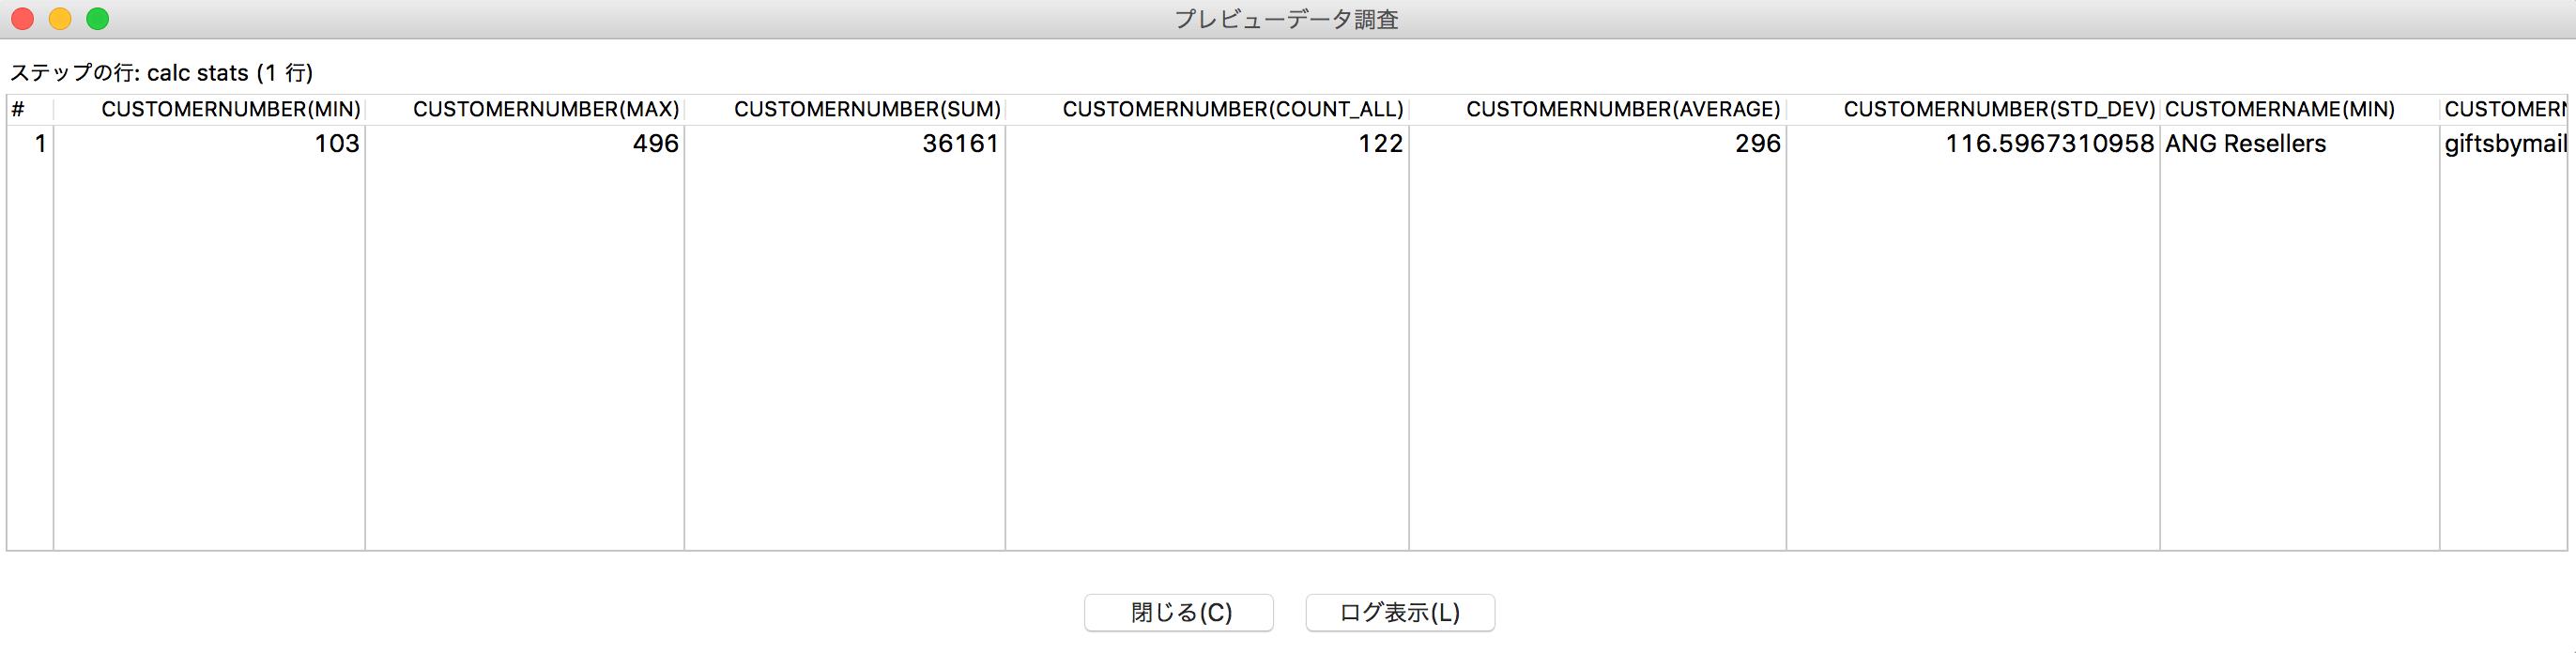 PDI_Table_11.png